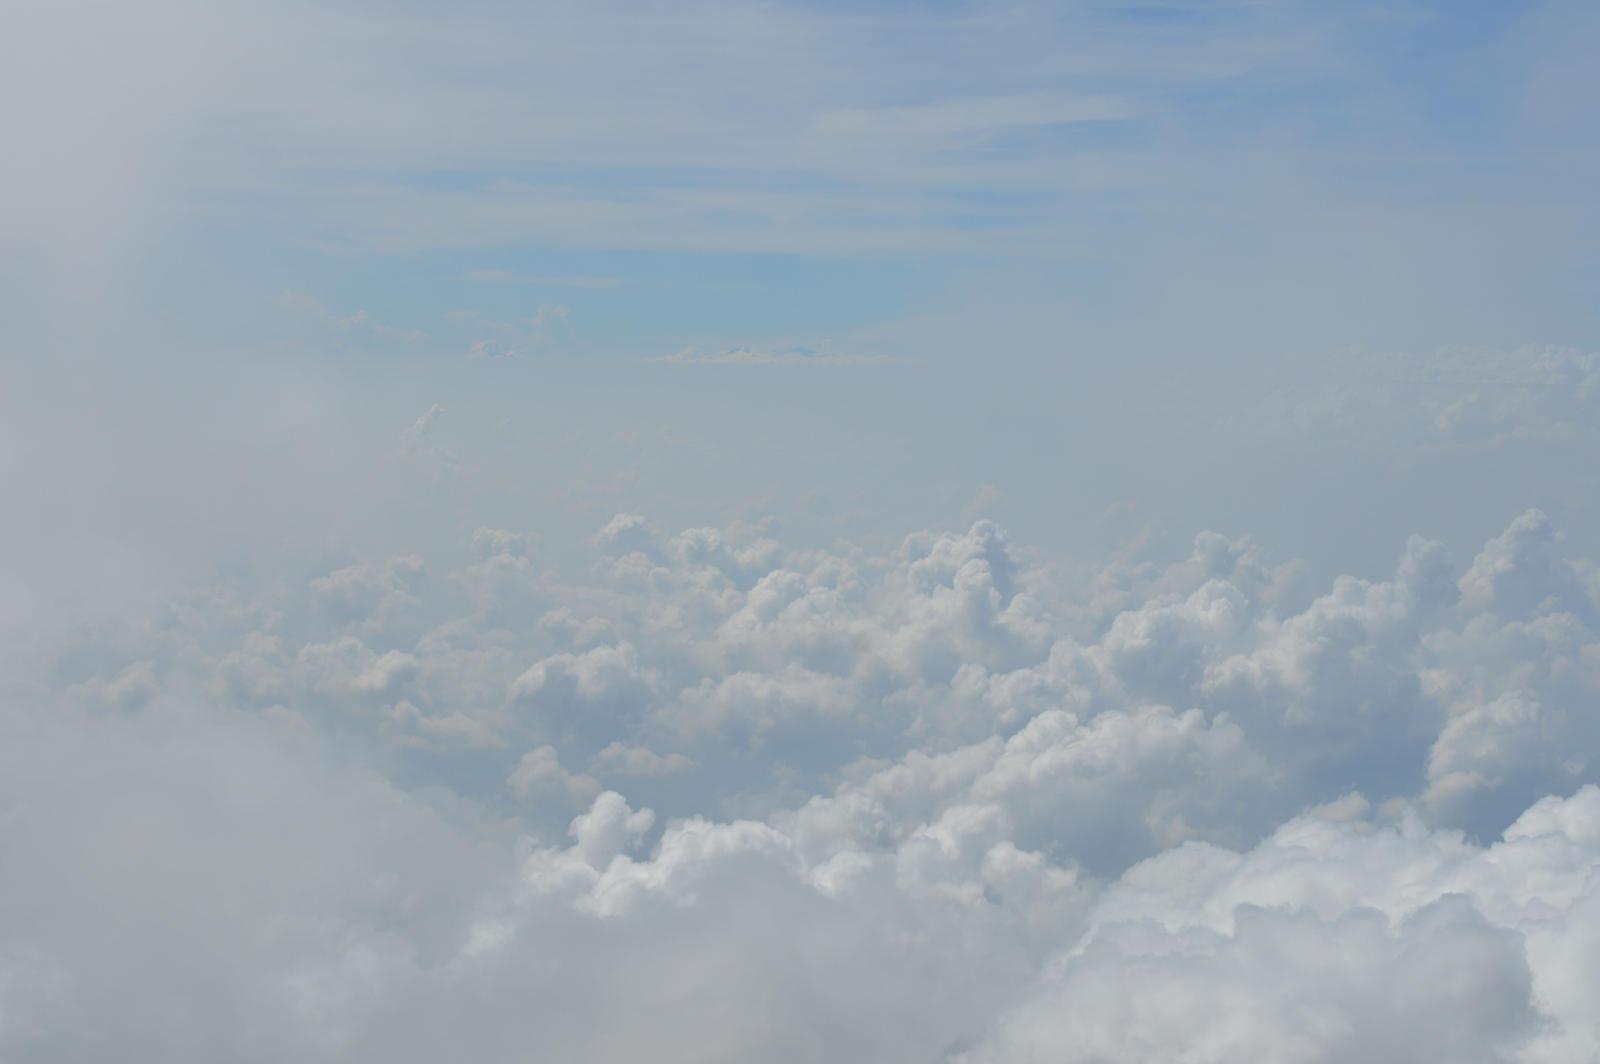 Above The Sky Lawu By Adipancawh by Adipancawh